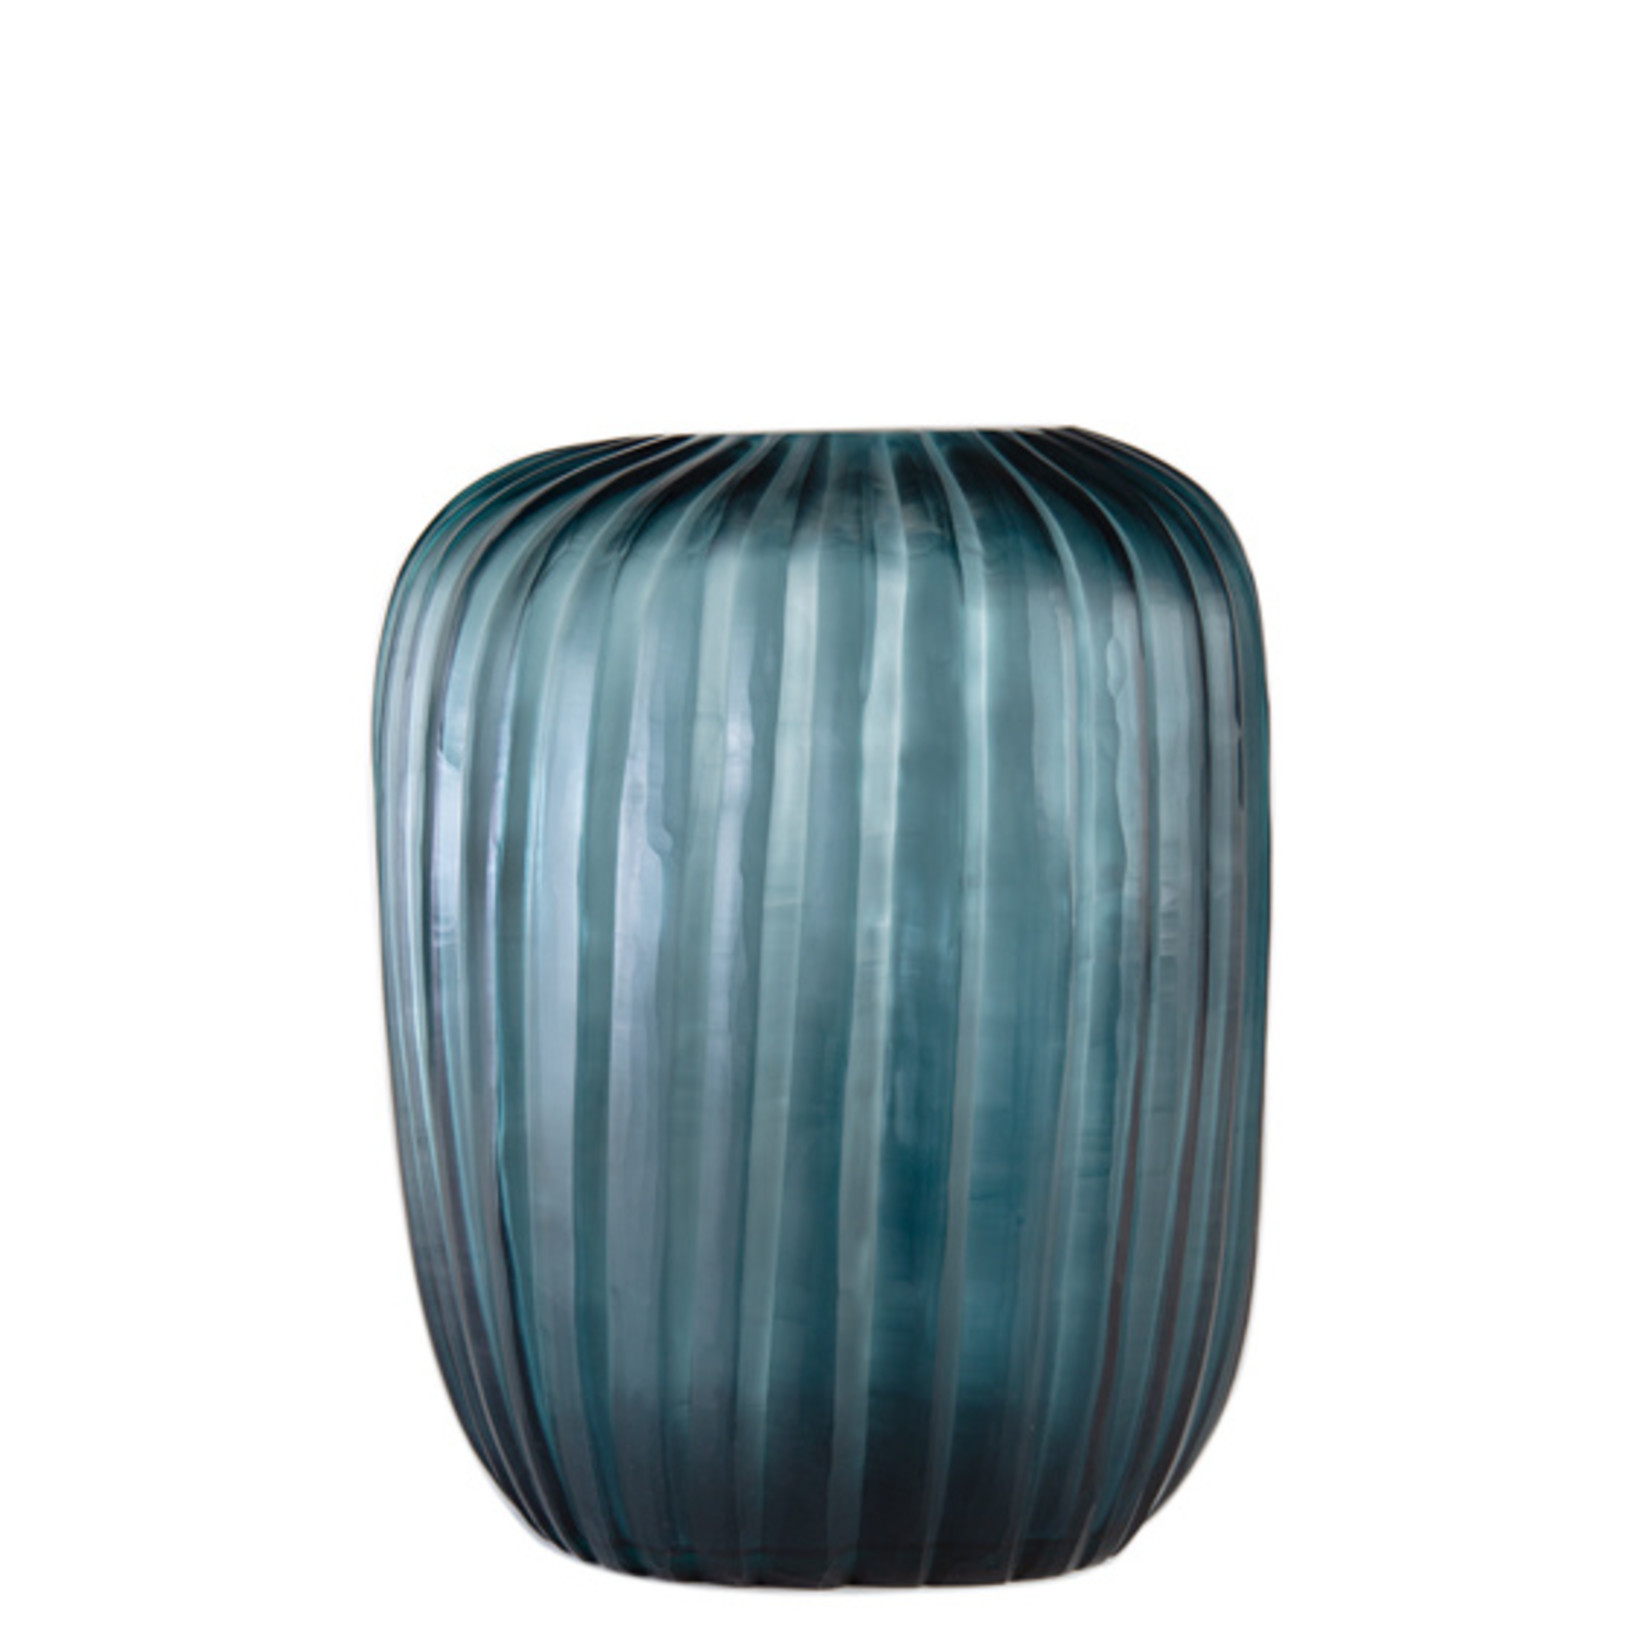 Guaxs Vase Manakara Tall   Ocean Blue / Indigo